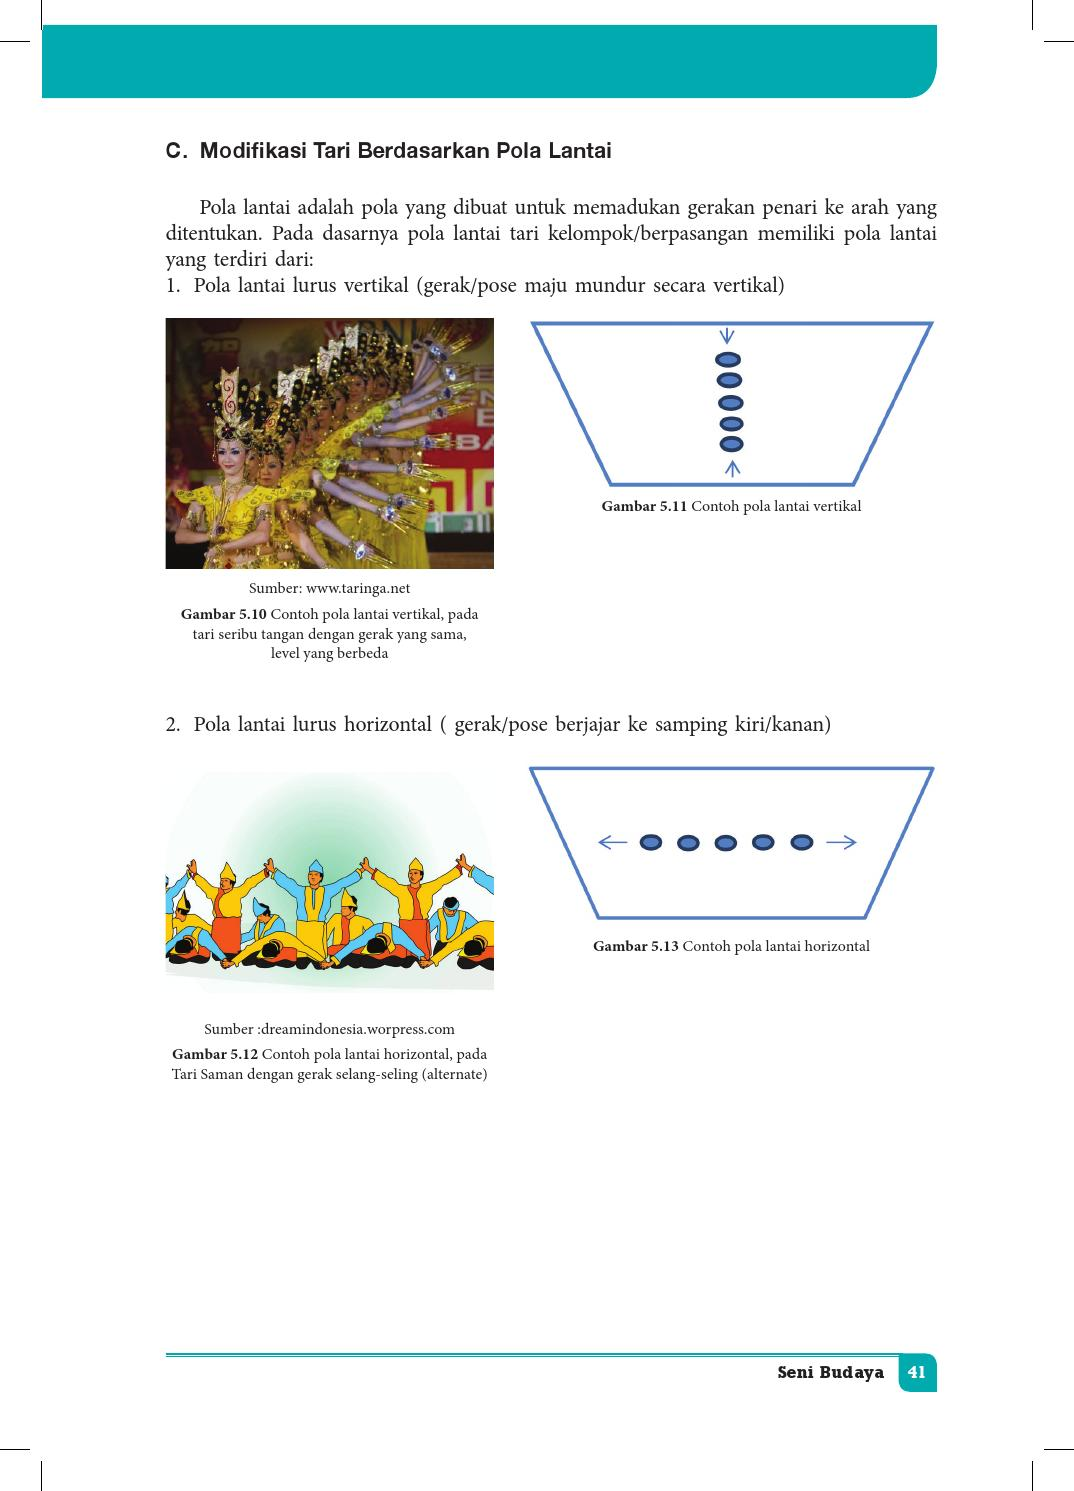 Seni Budaya Sma Ma Smk Mak Kelas Xi Semester 2 By Perpus Sma Marsud Issuu